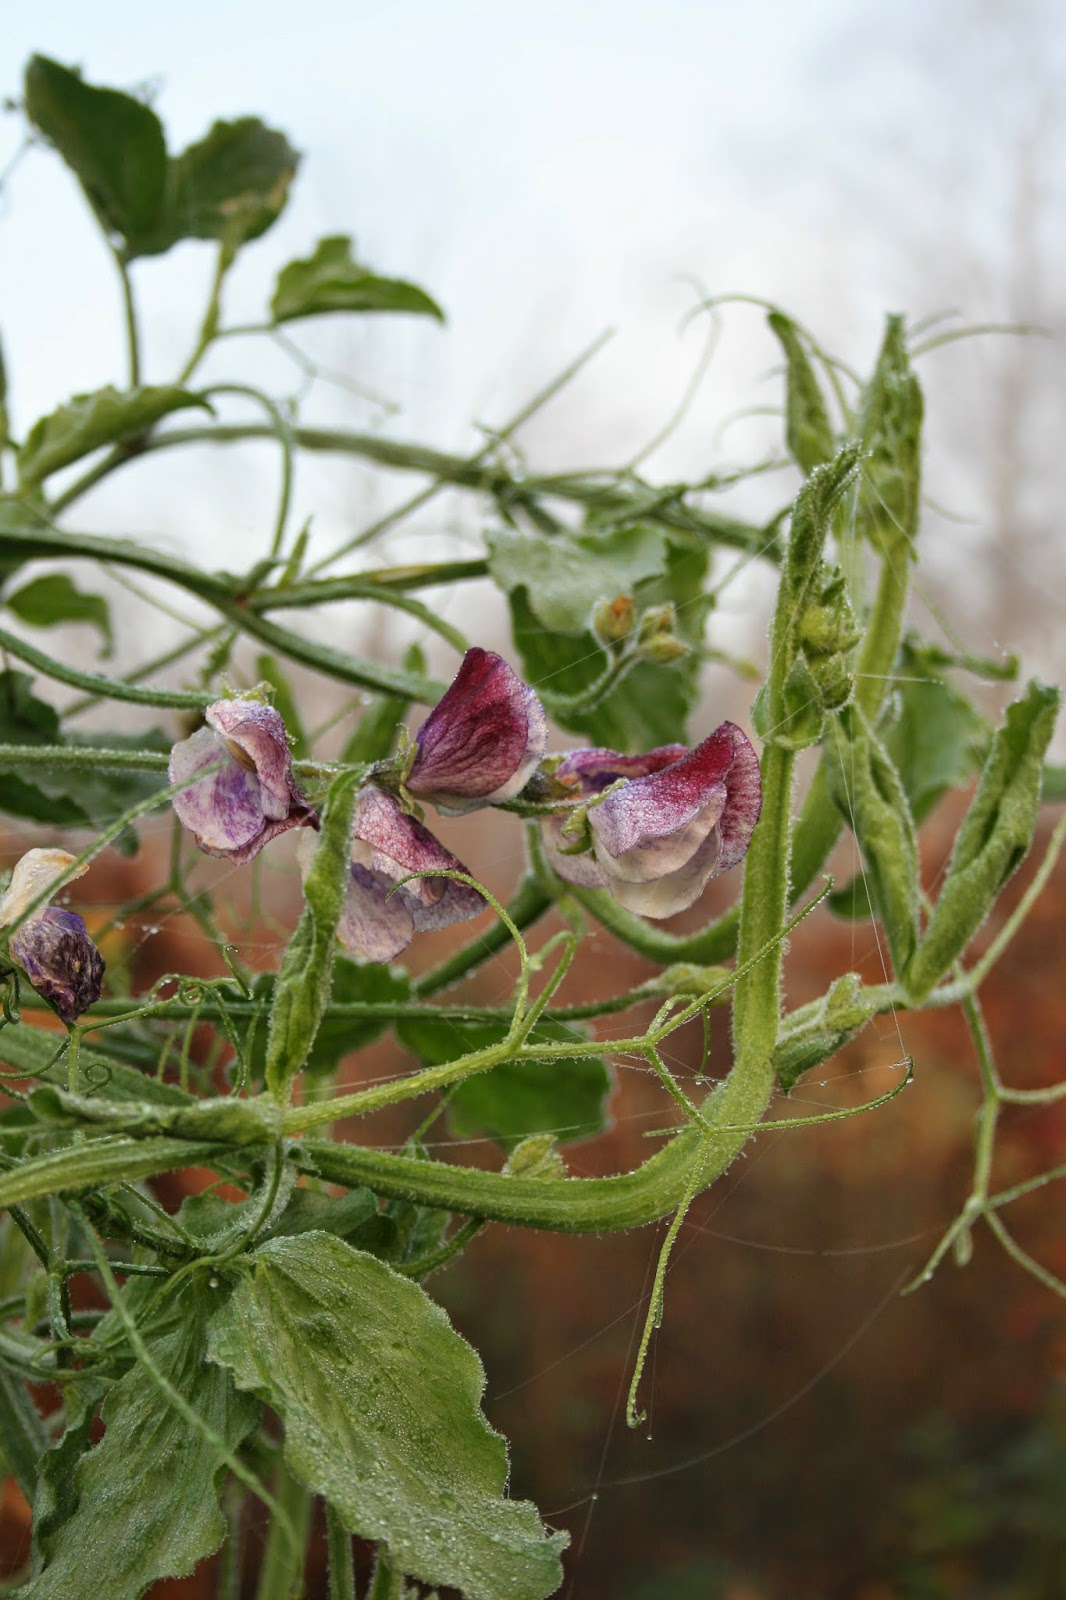 trädgårdsblogg luktärt lathyrus odoratus